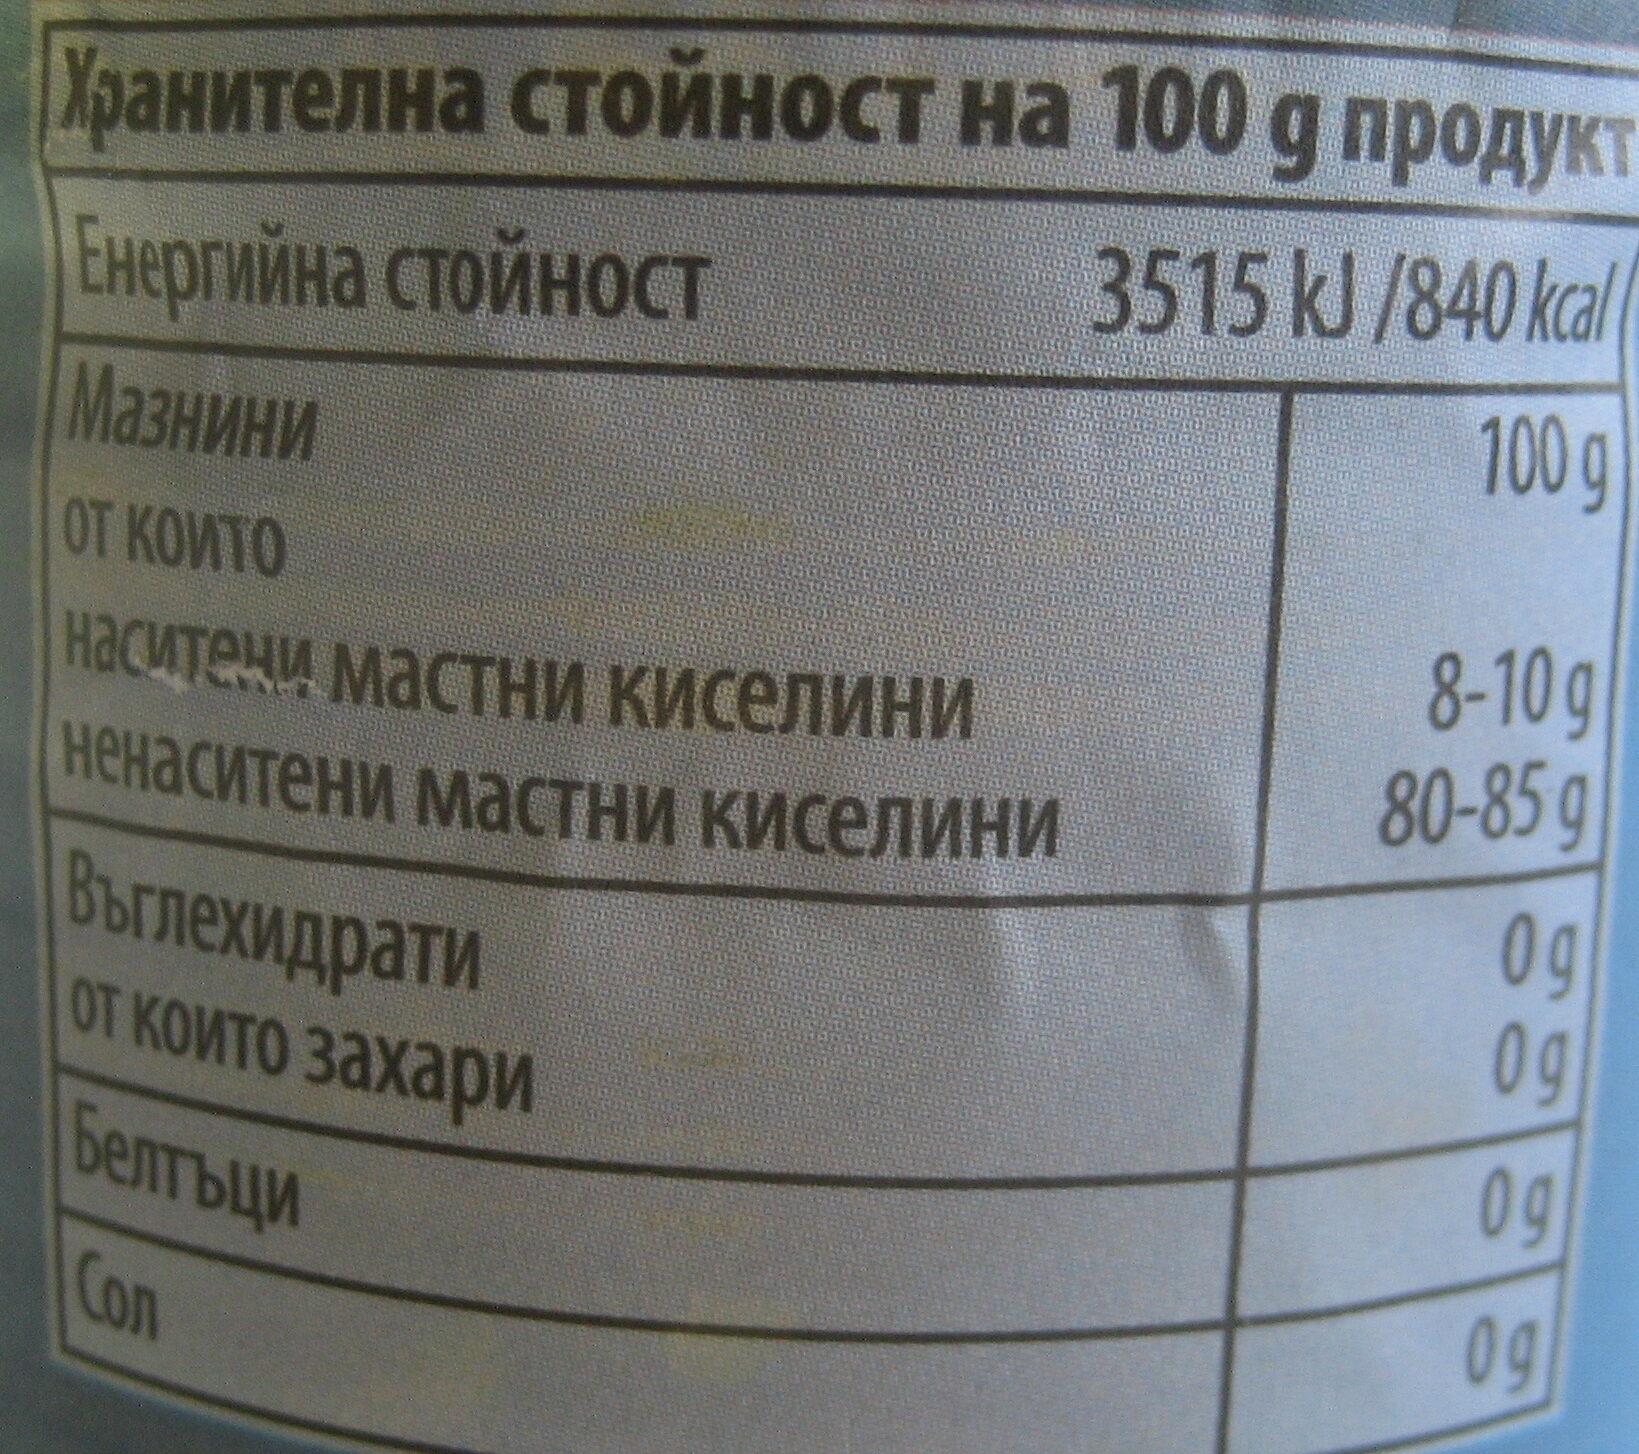 Рафинирано 100% слънчогледово олио - Informations nutritionnelles - bg